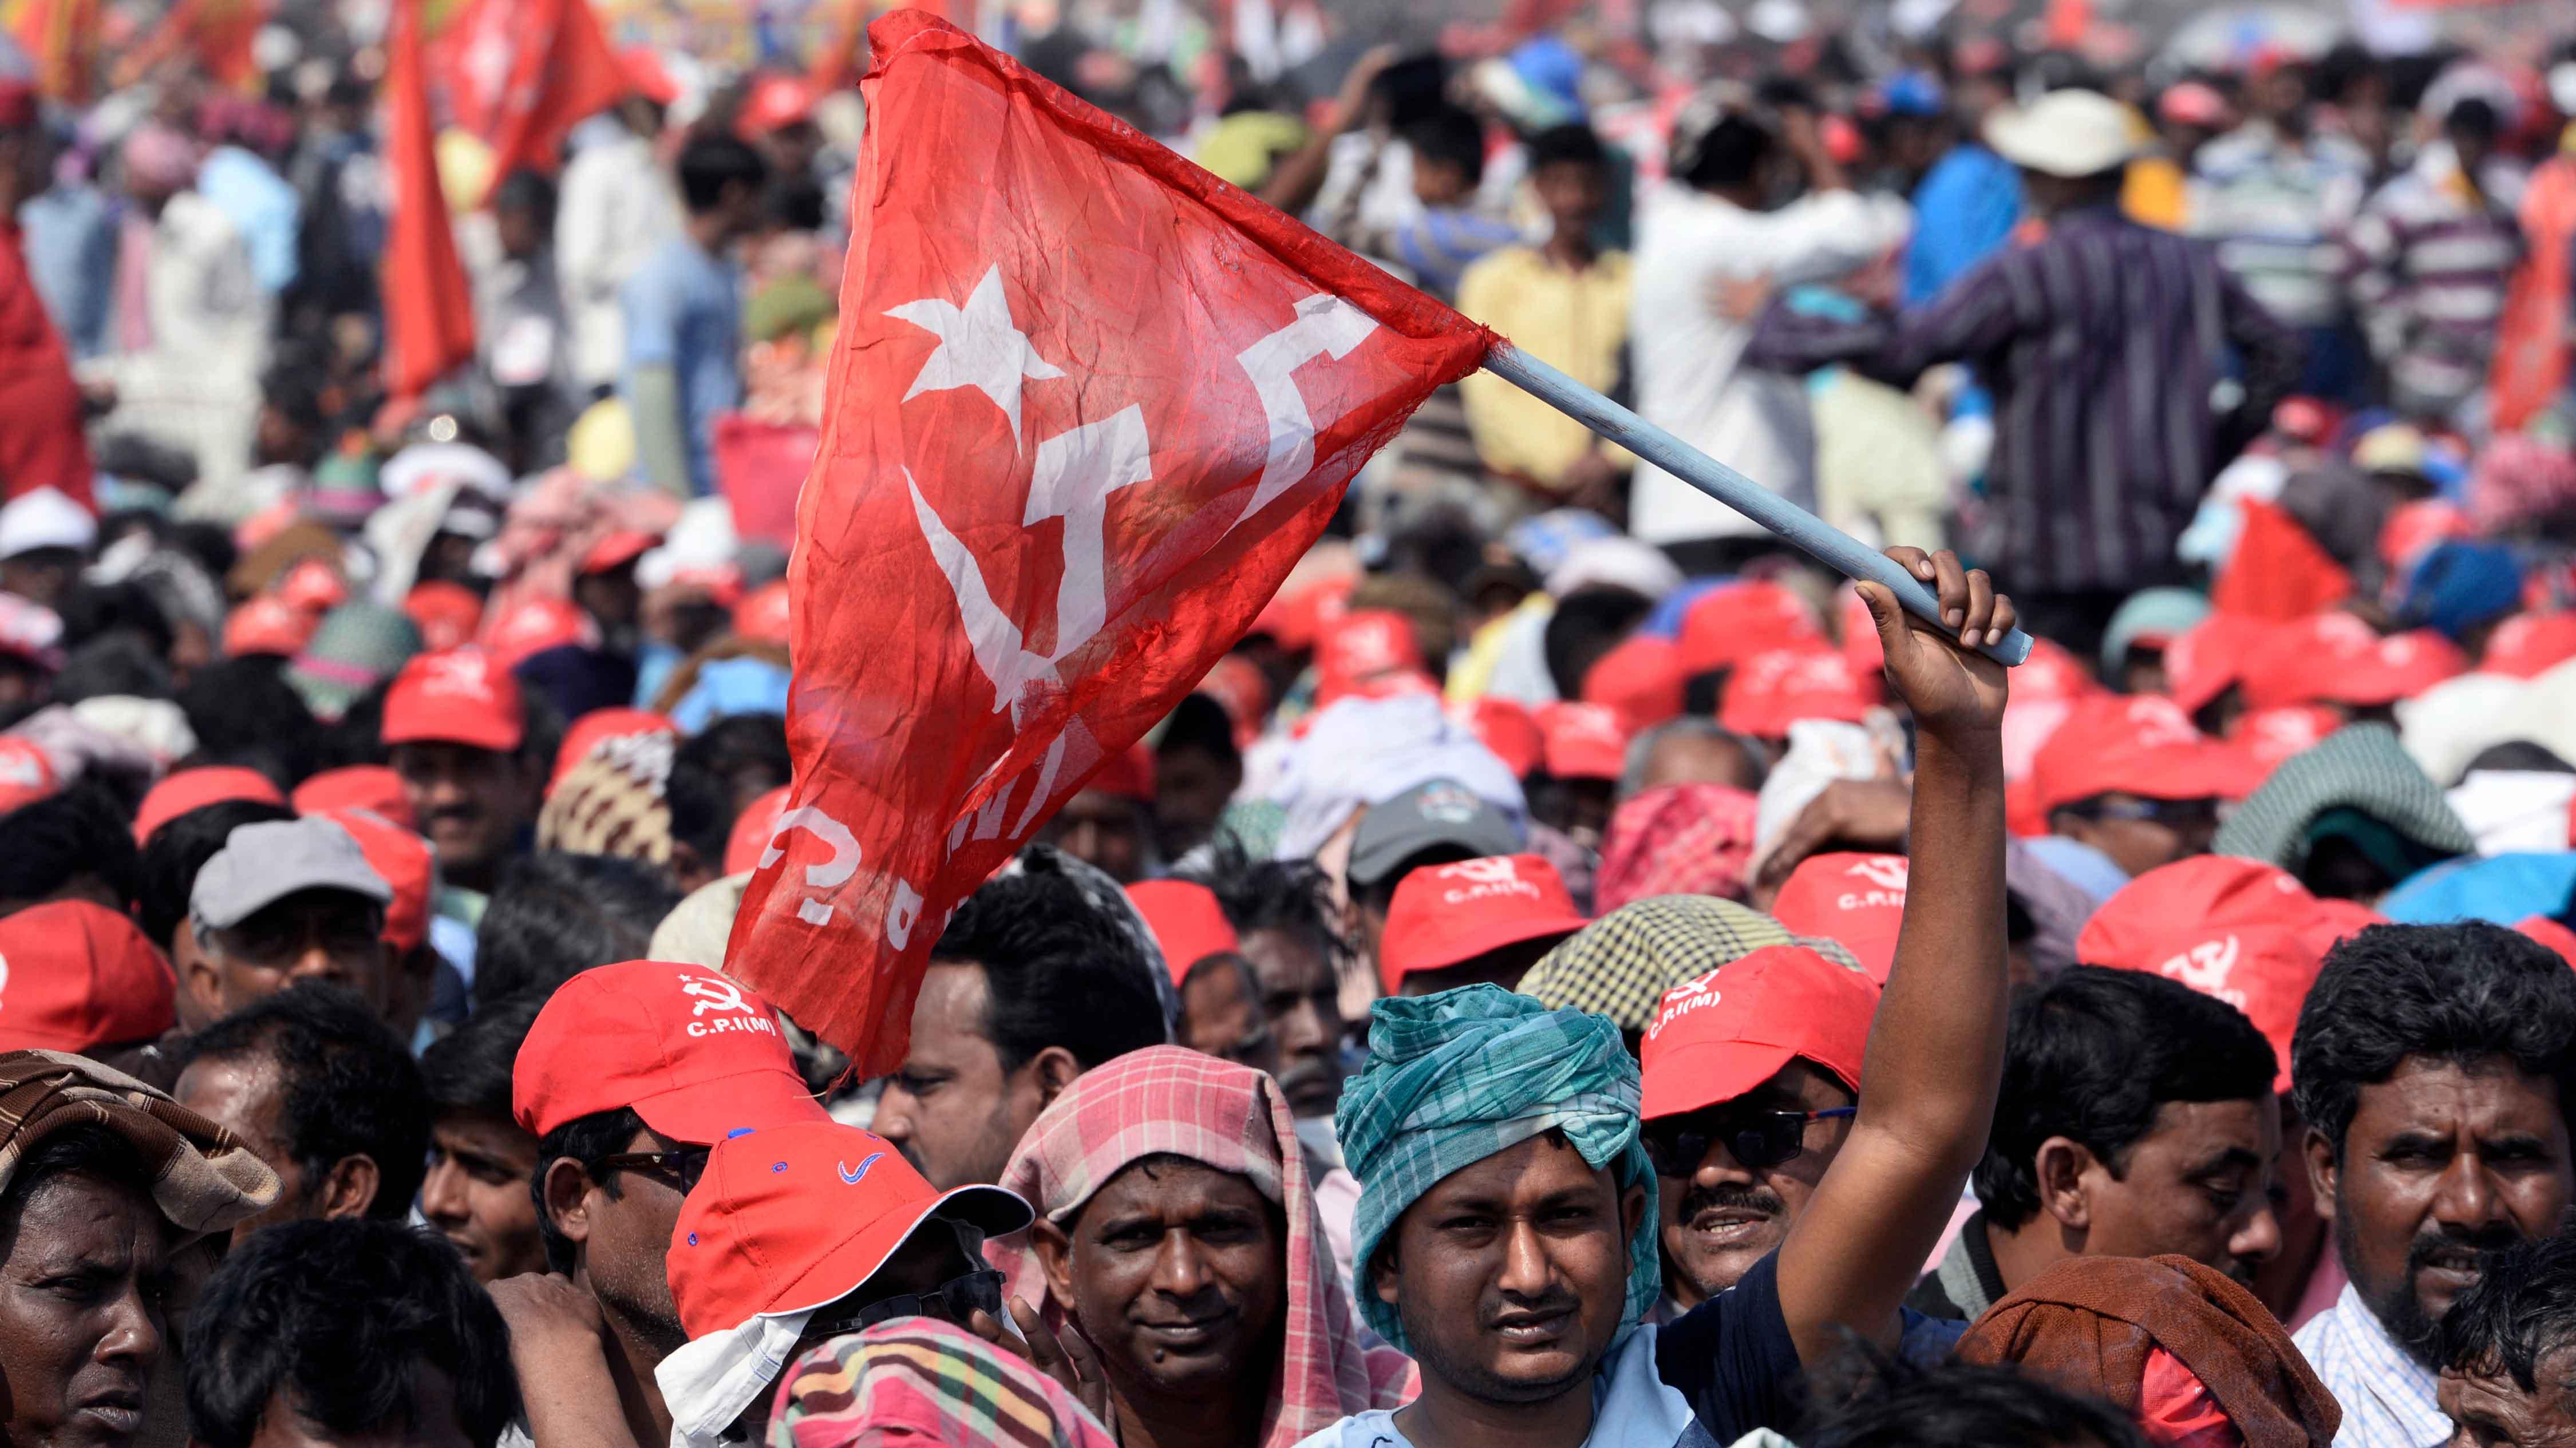 Congress leader joins CPM in Kerala